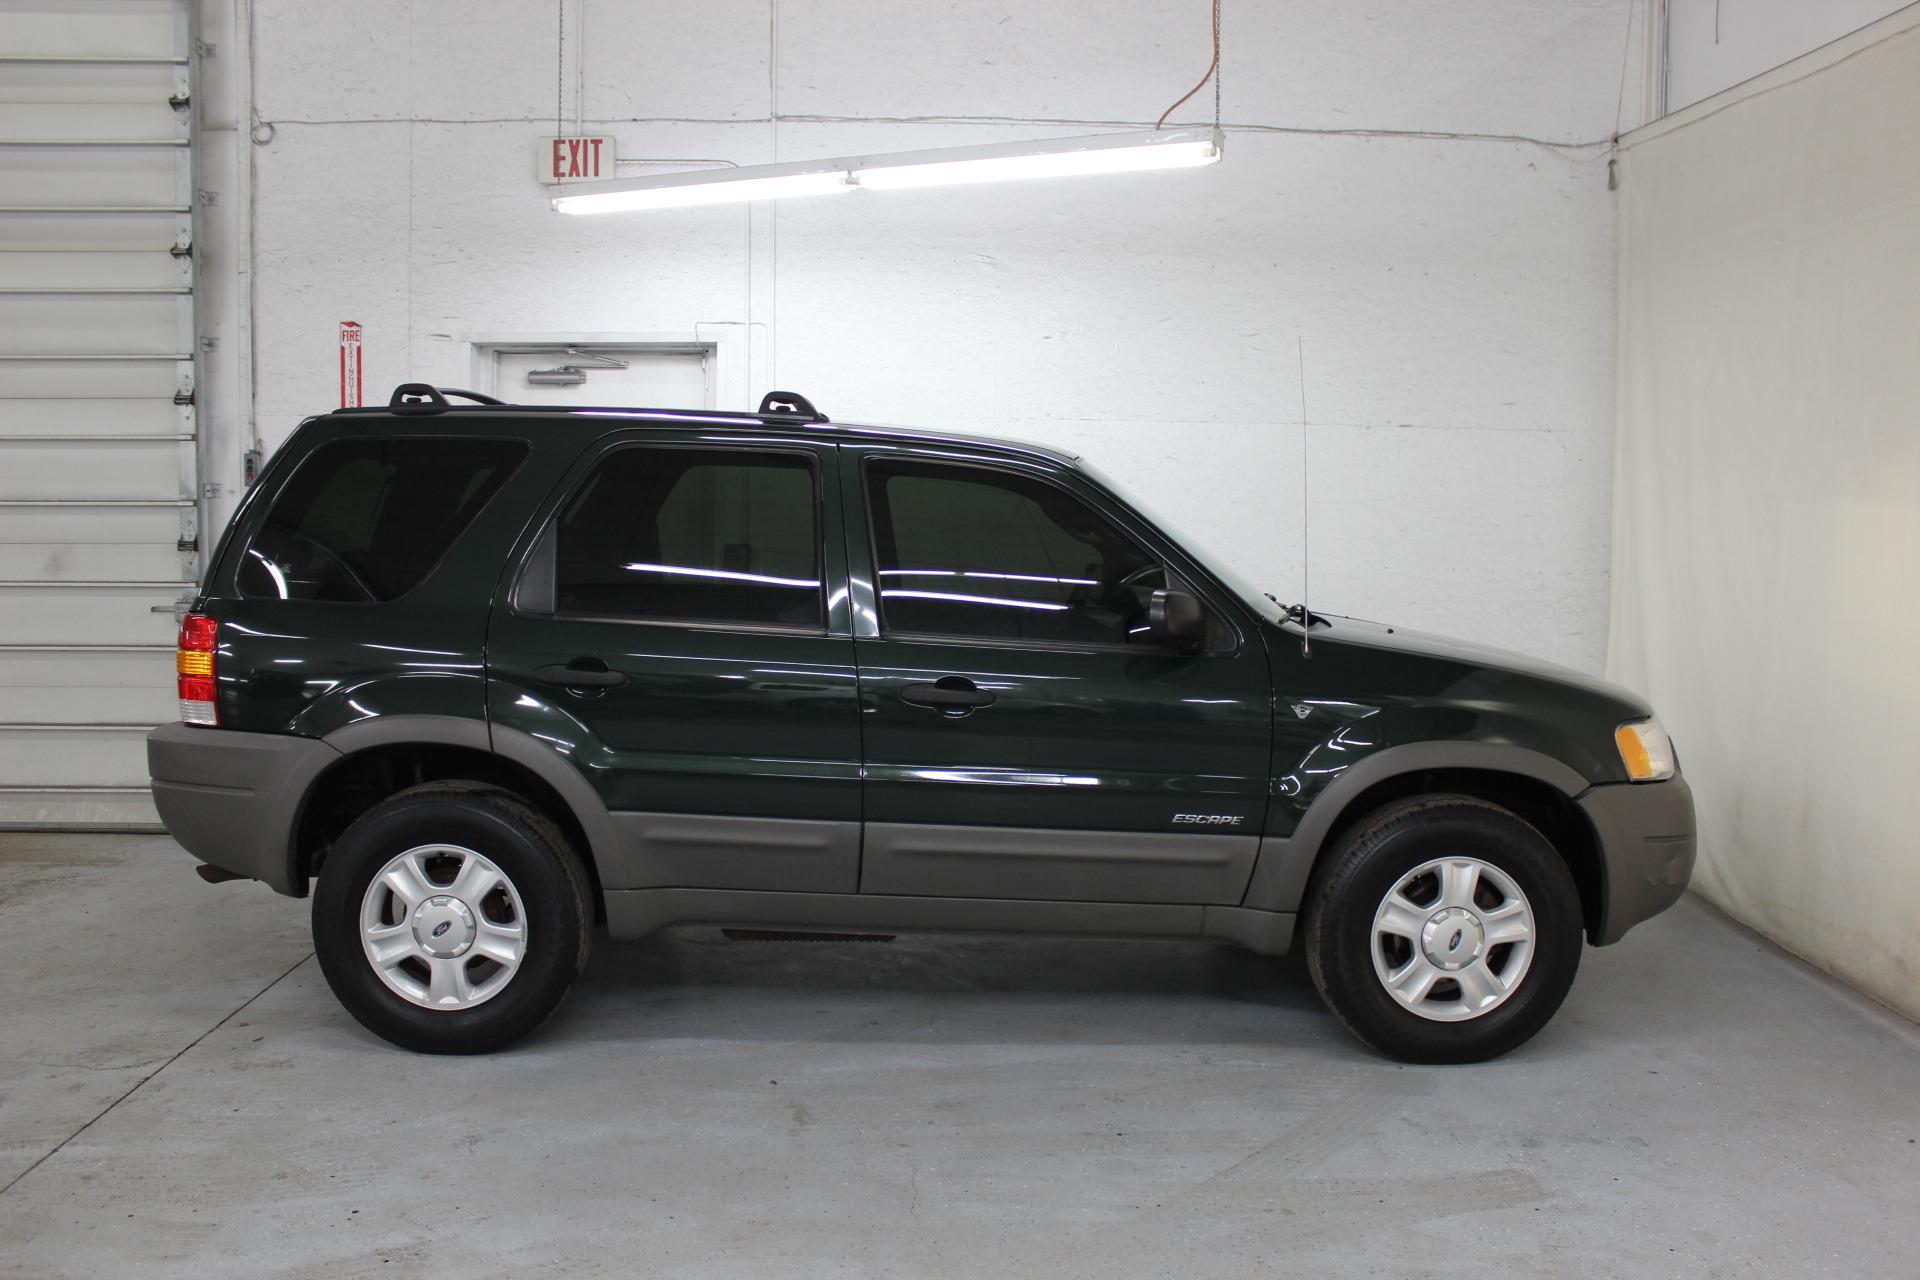 2001 ford escape xlt fuel economy. Black Bedroom Furniture Sets. Home Design Ideas